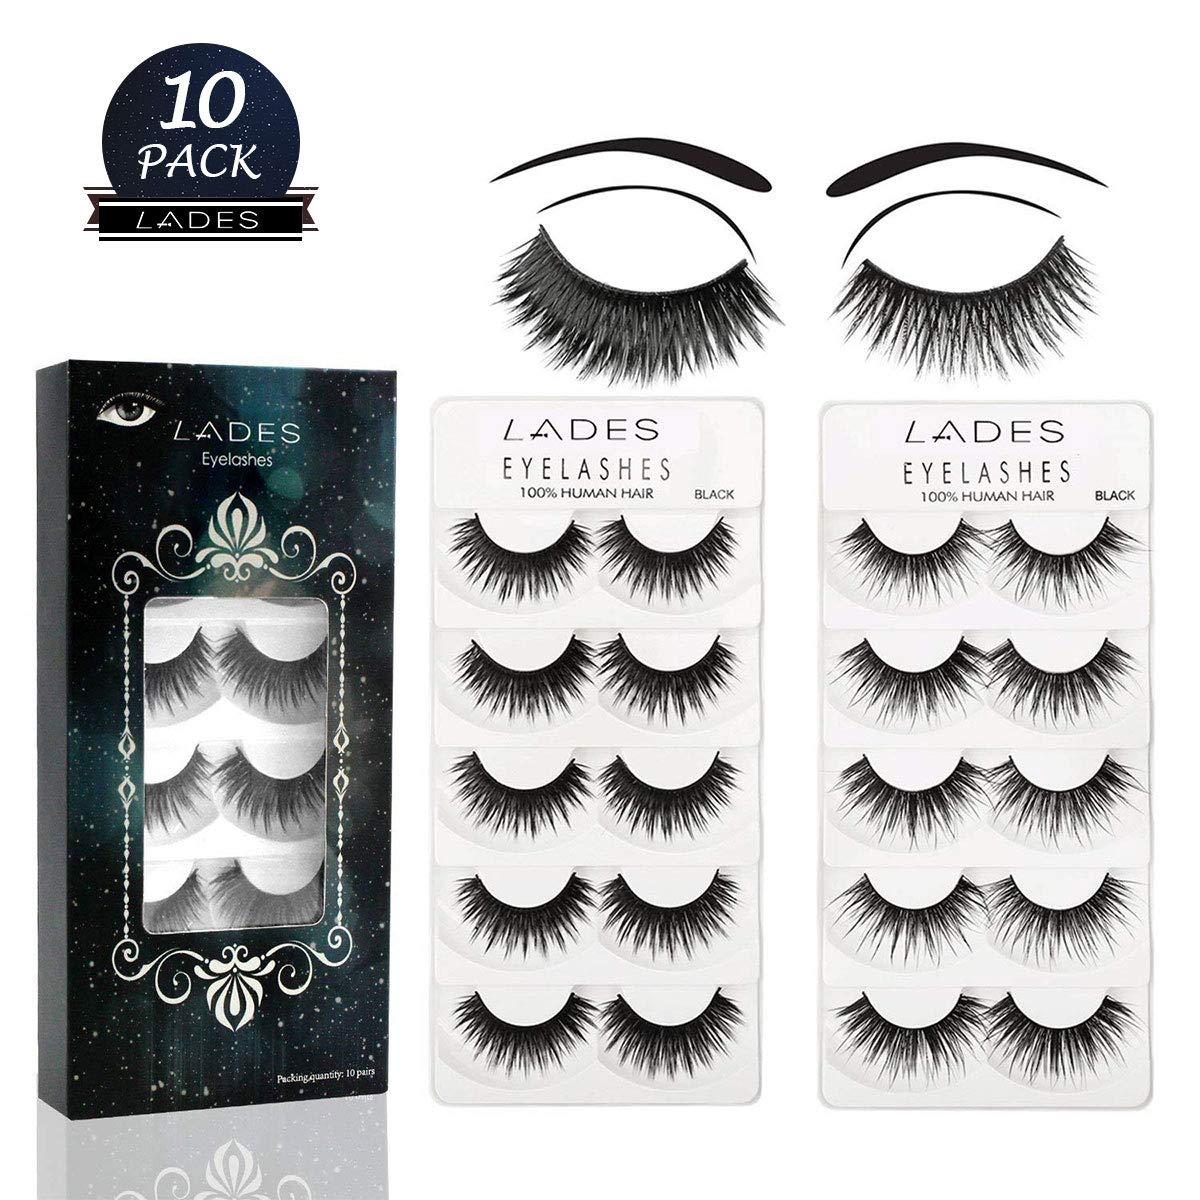 627f89f4942 False Eyelashes - 10 Pair Multipack Natural 3D False Eyelashes Natural Look  For Makeup Eyelashes Extension: Amazon.co.uk: Beauty